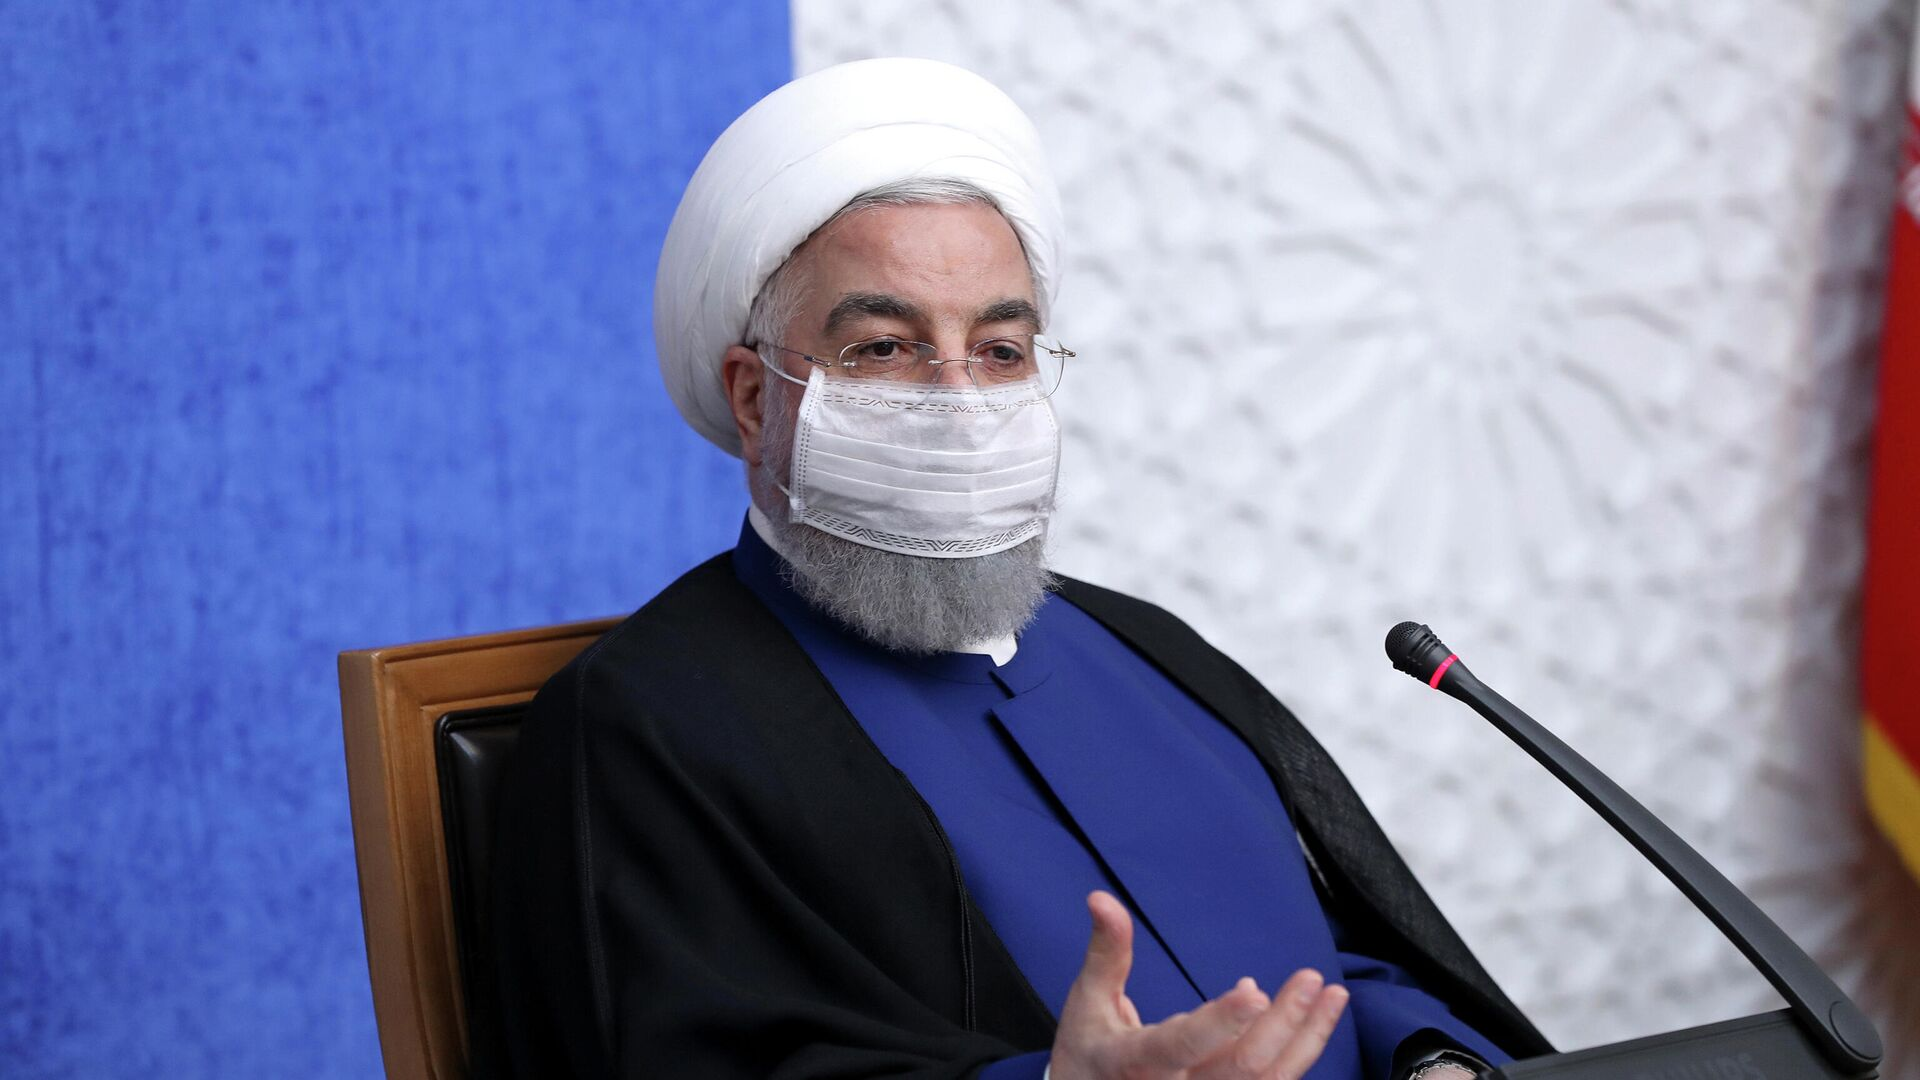 Президент Исламской Республики Иран Хасан Роухани  - РИА Новости, 1920, 27.01.2021